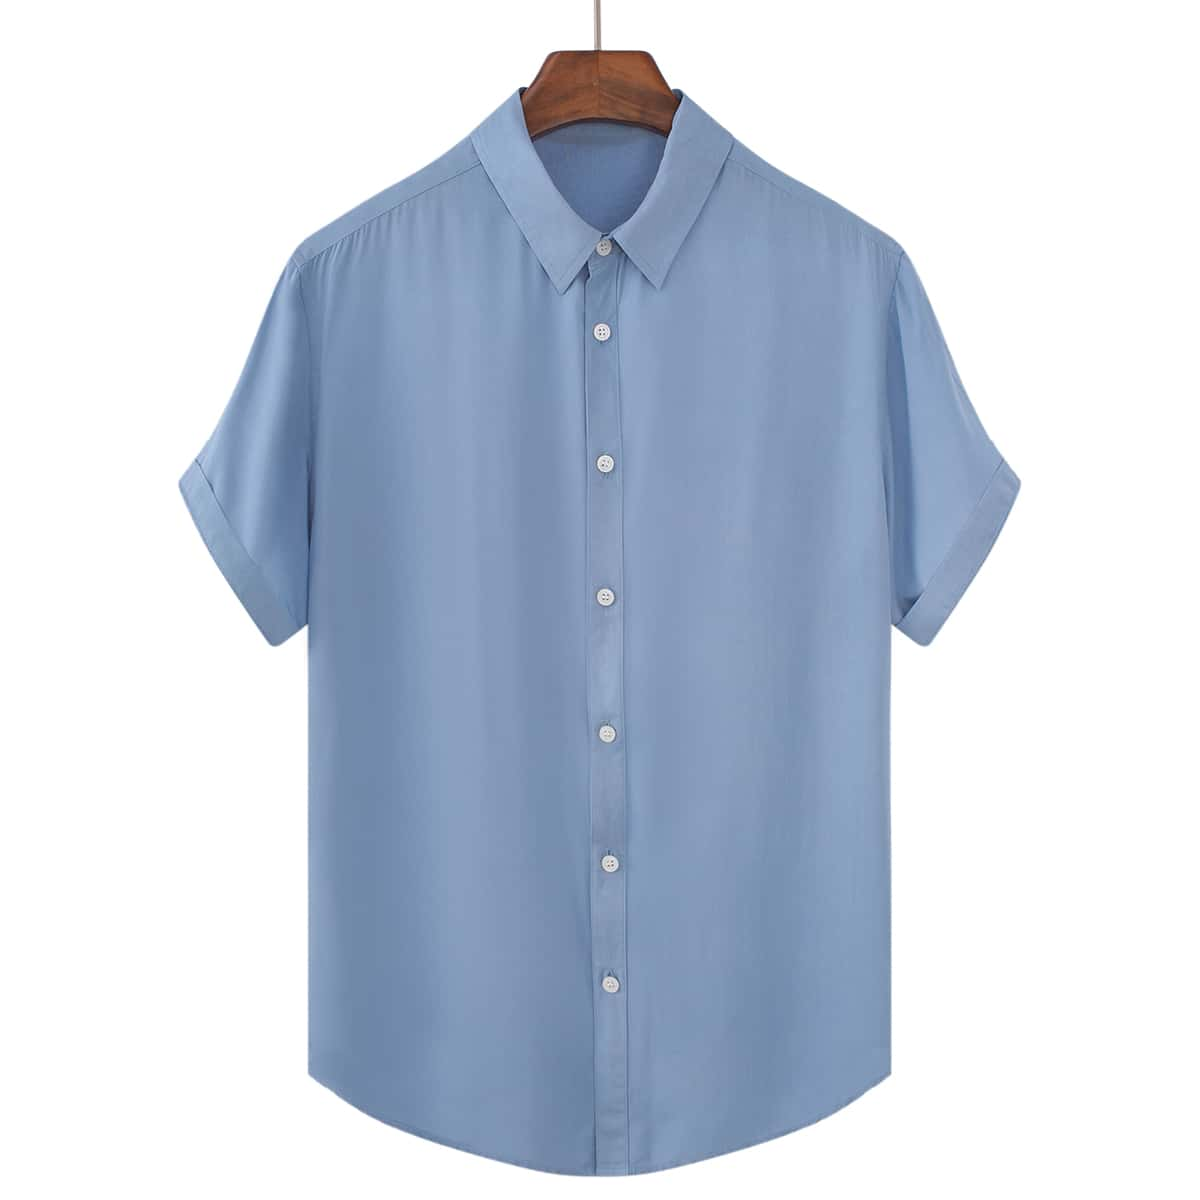 Мужская однотонная рубашка на пуговицах